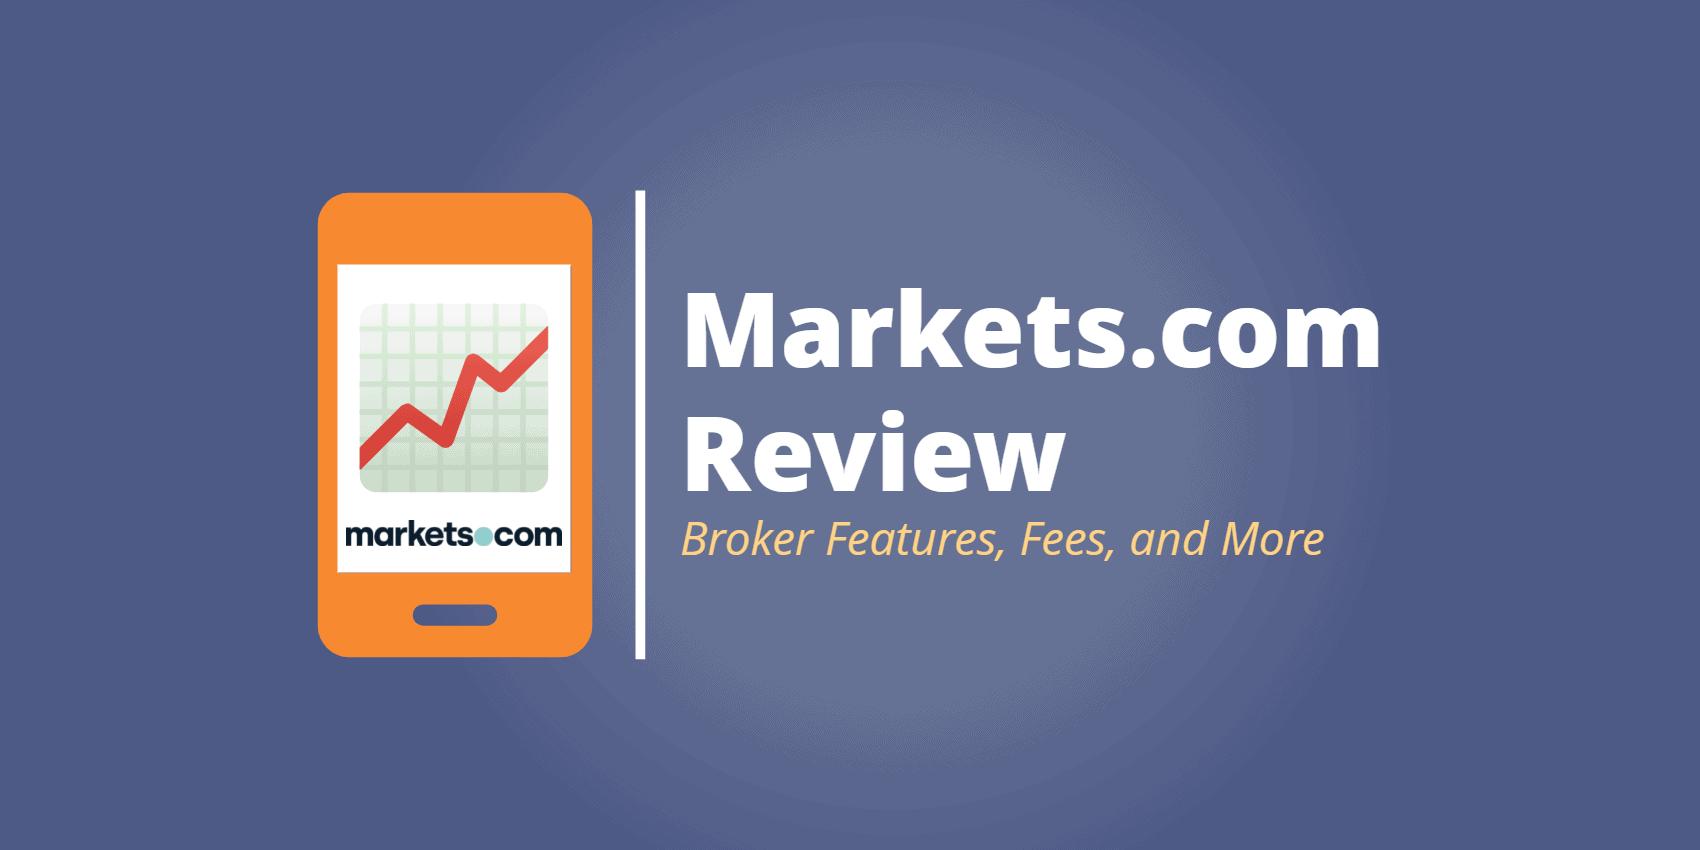 markets.com featured